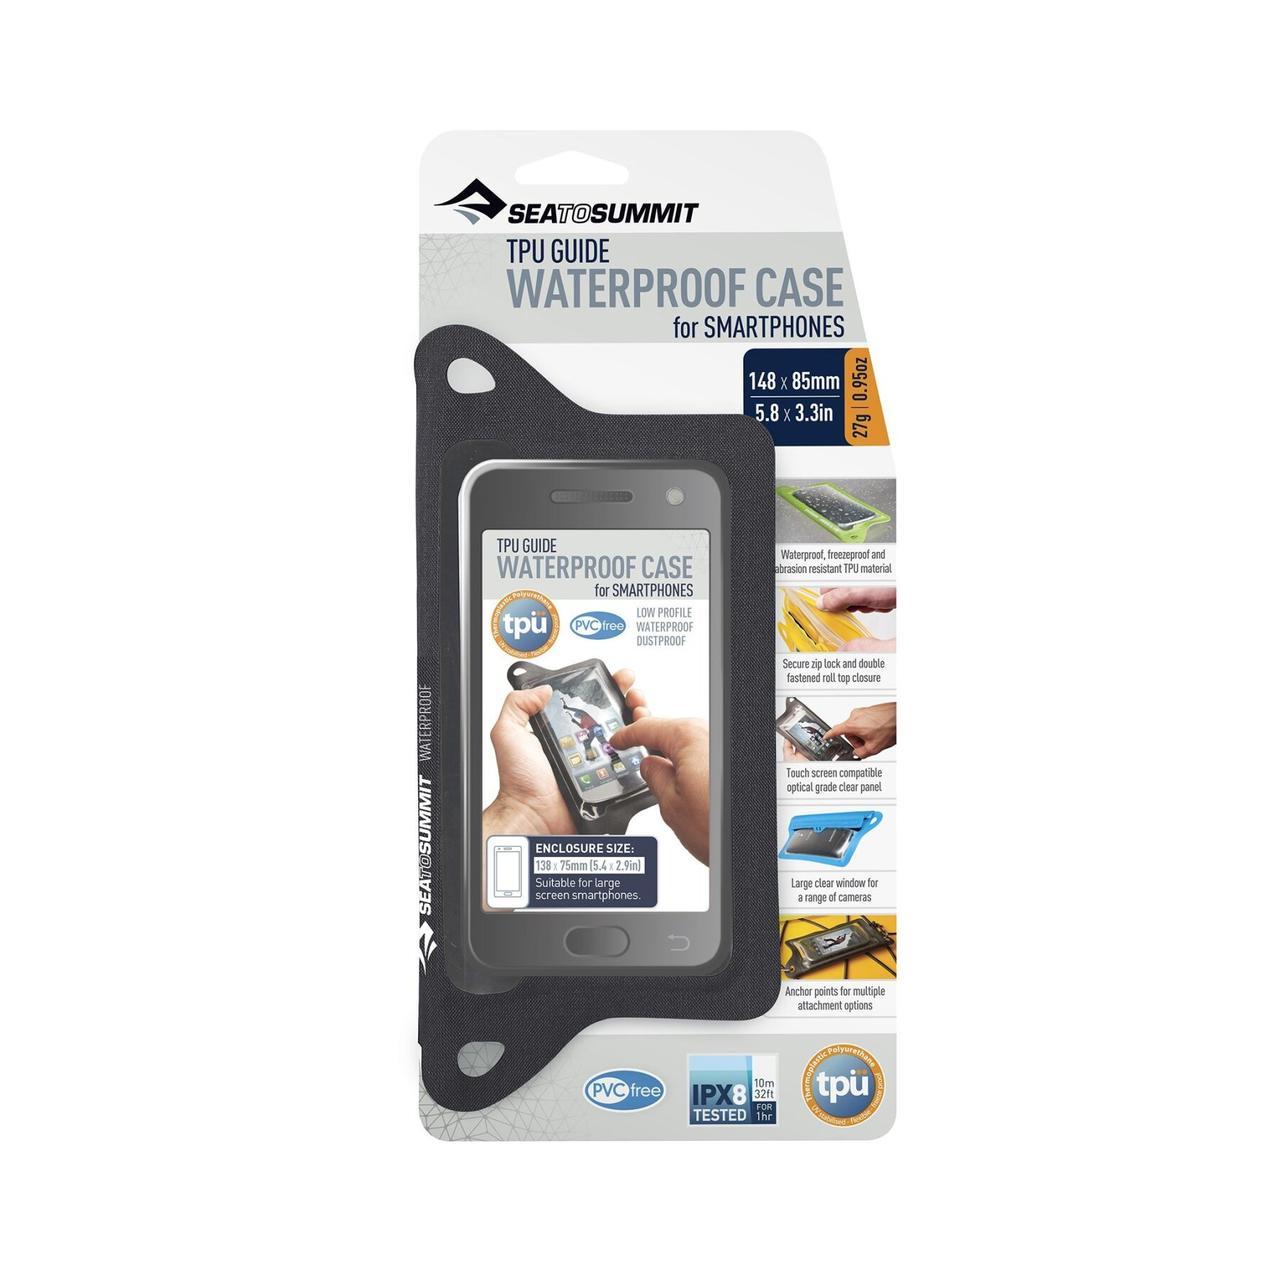 Гермочехол для телефона Sea To Summit - TPU Guide W/P Case for Smartphones Black, 13 х 7 см (STS ACTPUSMARTPHBK)(Размер 13 х 7 см)